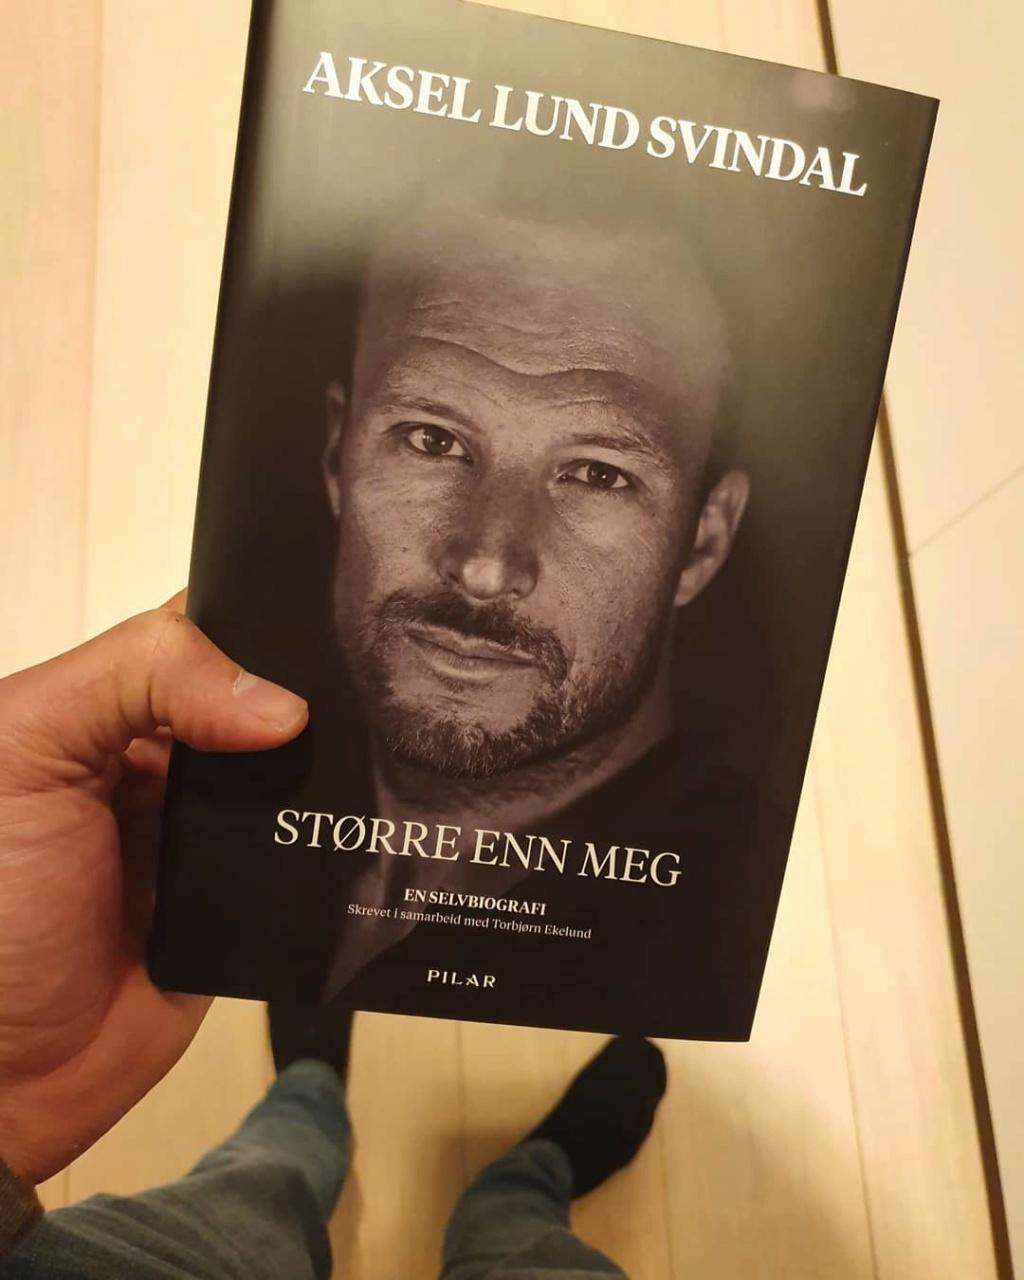 Aksel Lund Svindal - Страница 18 Asvind10